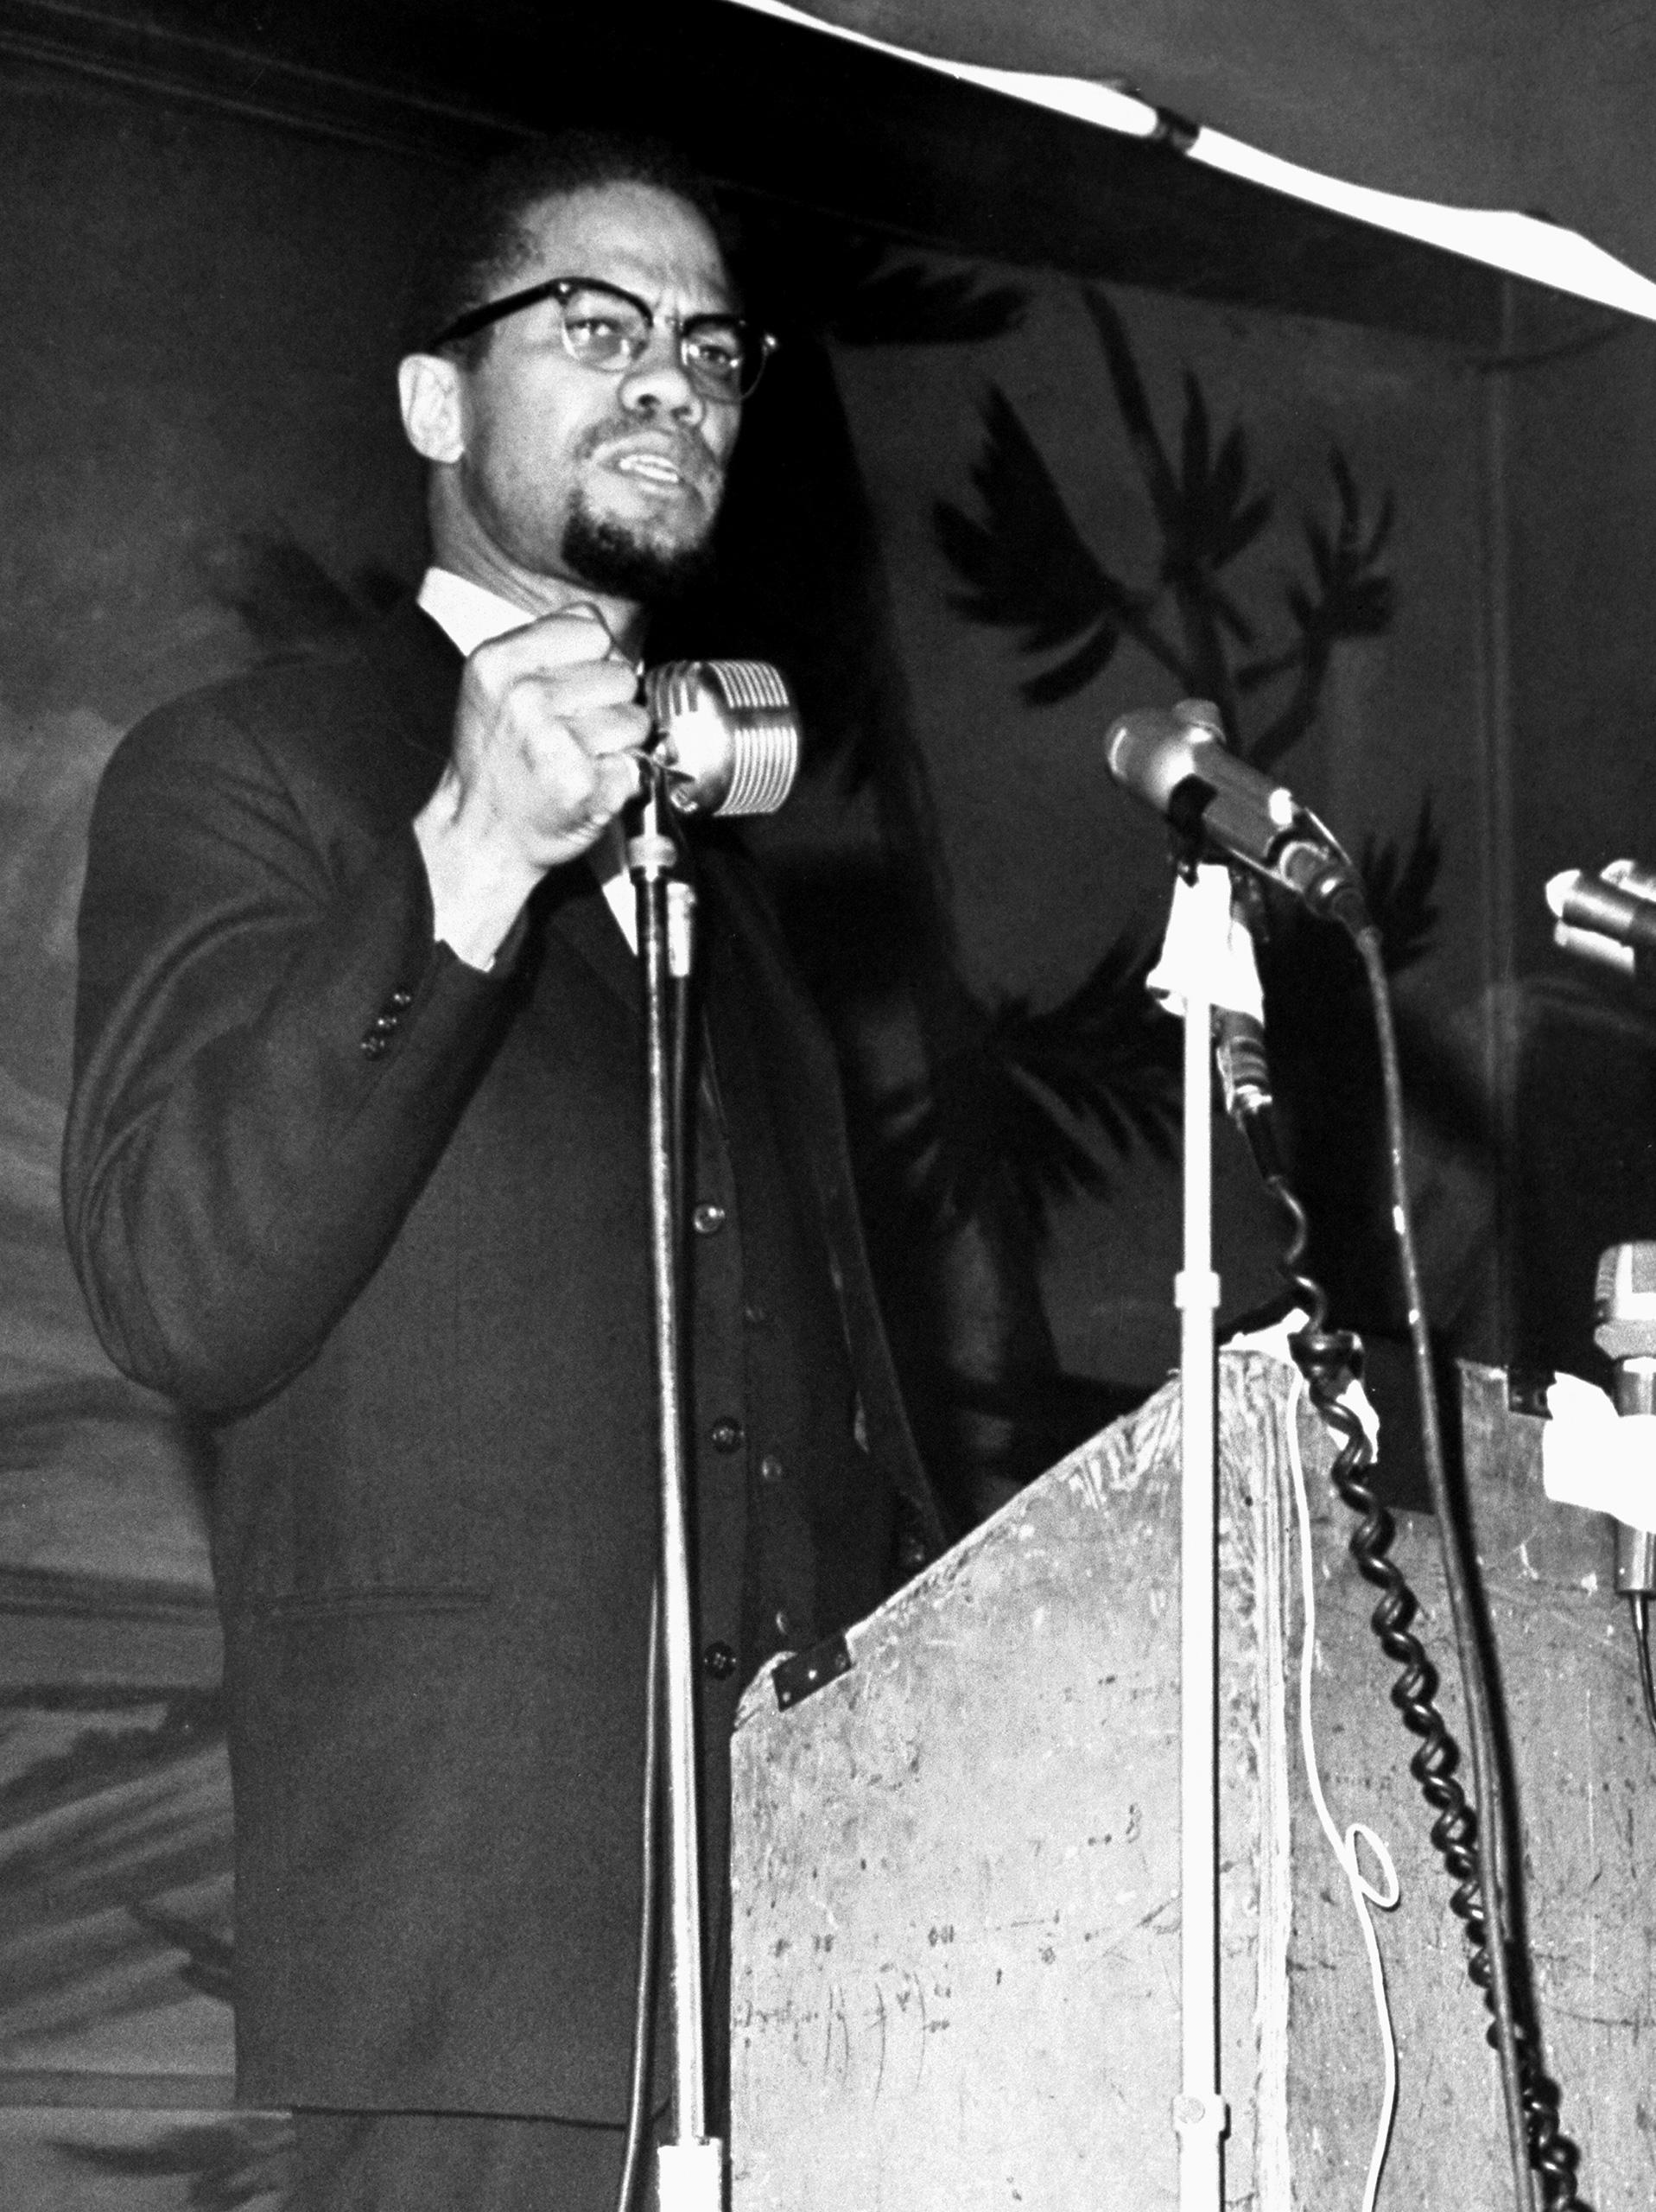 Malcolm X speaks at the Audubon Ballroom in Harlem on Feb. 15, 1965.